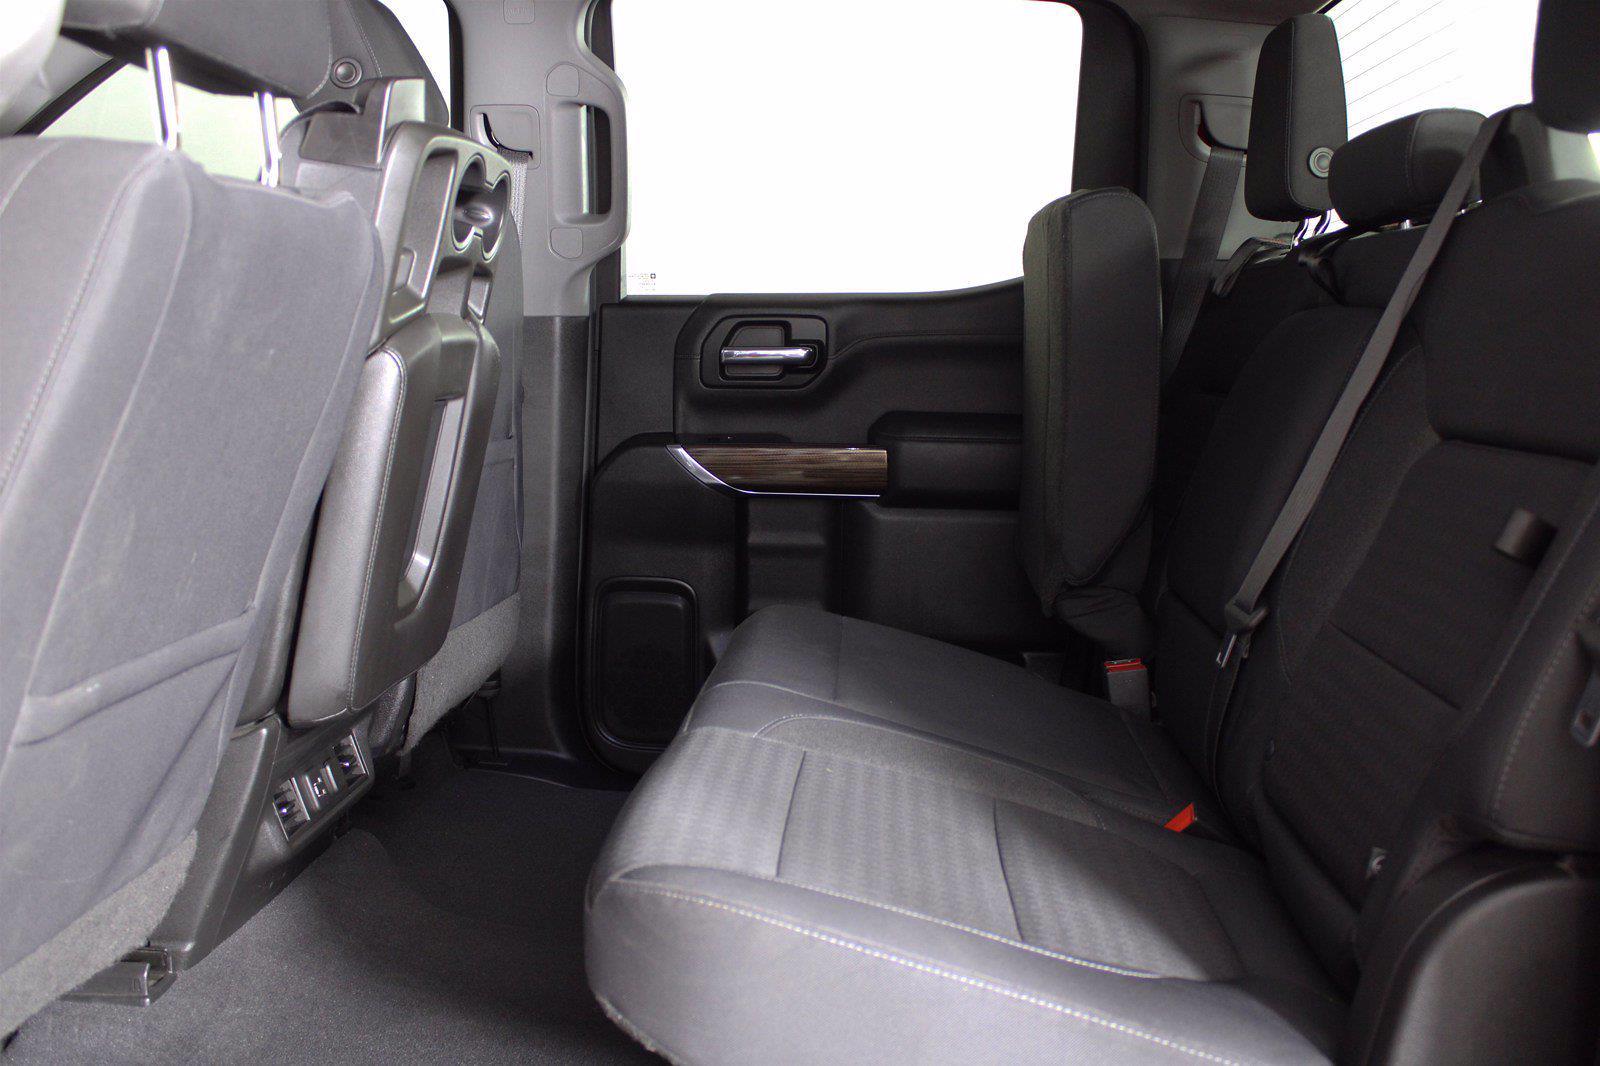 2019 Chevrolet Silverado 1500 Crew Cab 4x4, Pickup #D110798A - photo 6